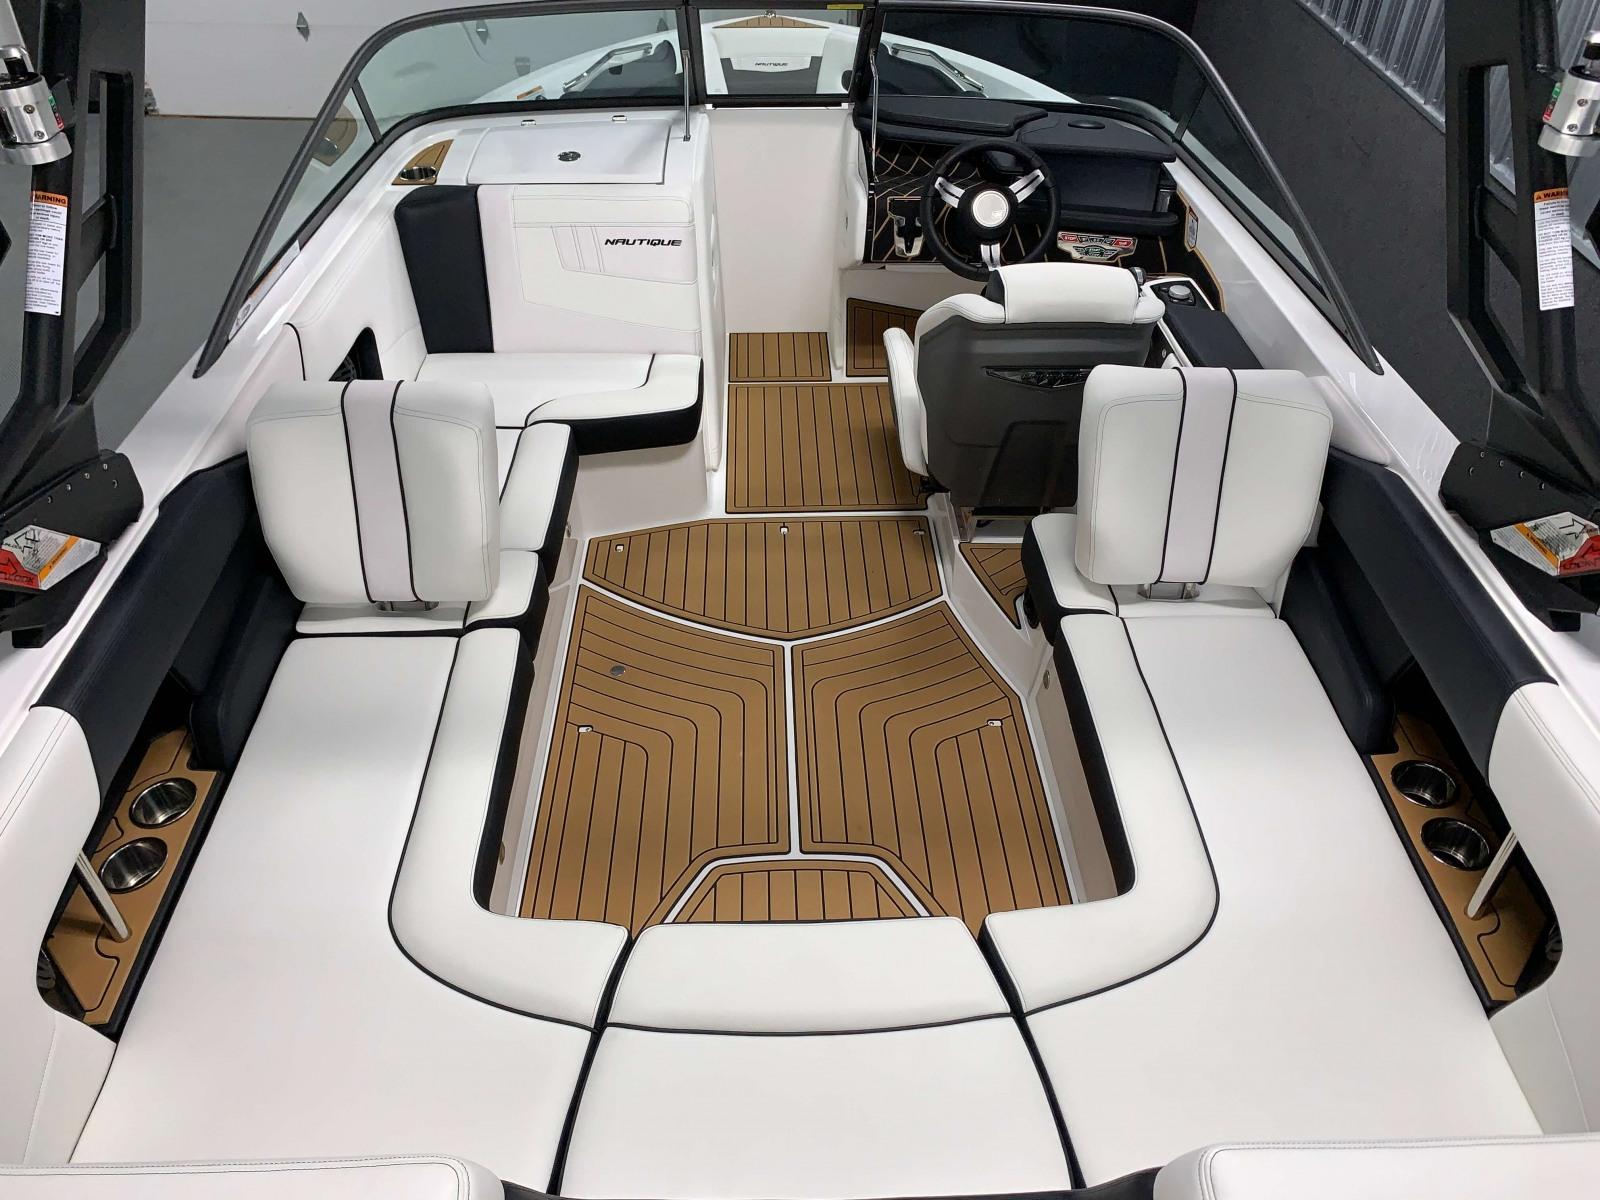 Interior Layout of the 2021 Nautique 230 Wake Boat